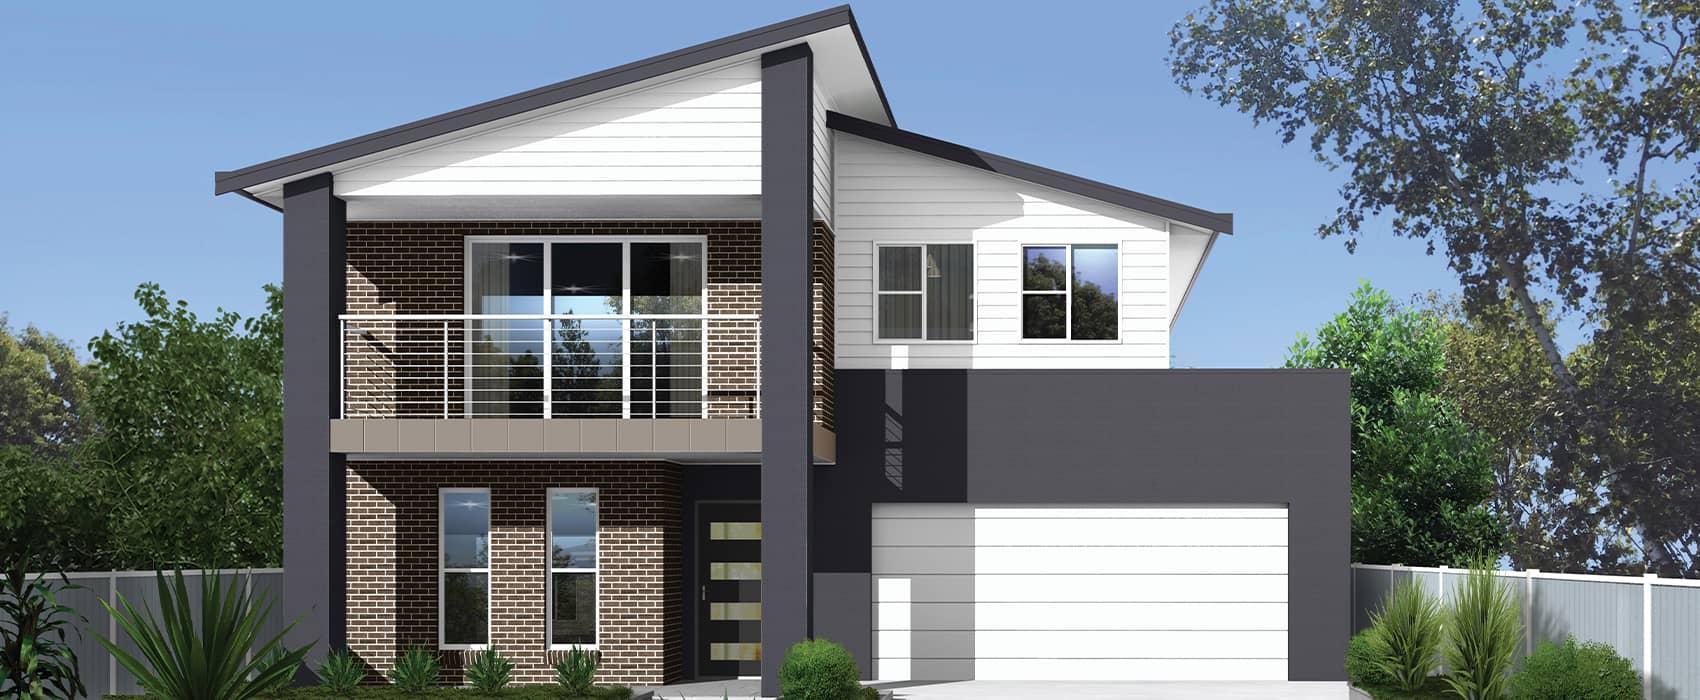 Sunset Home Design